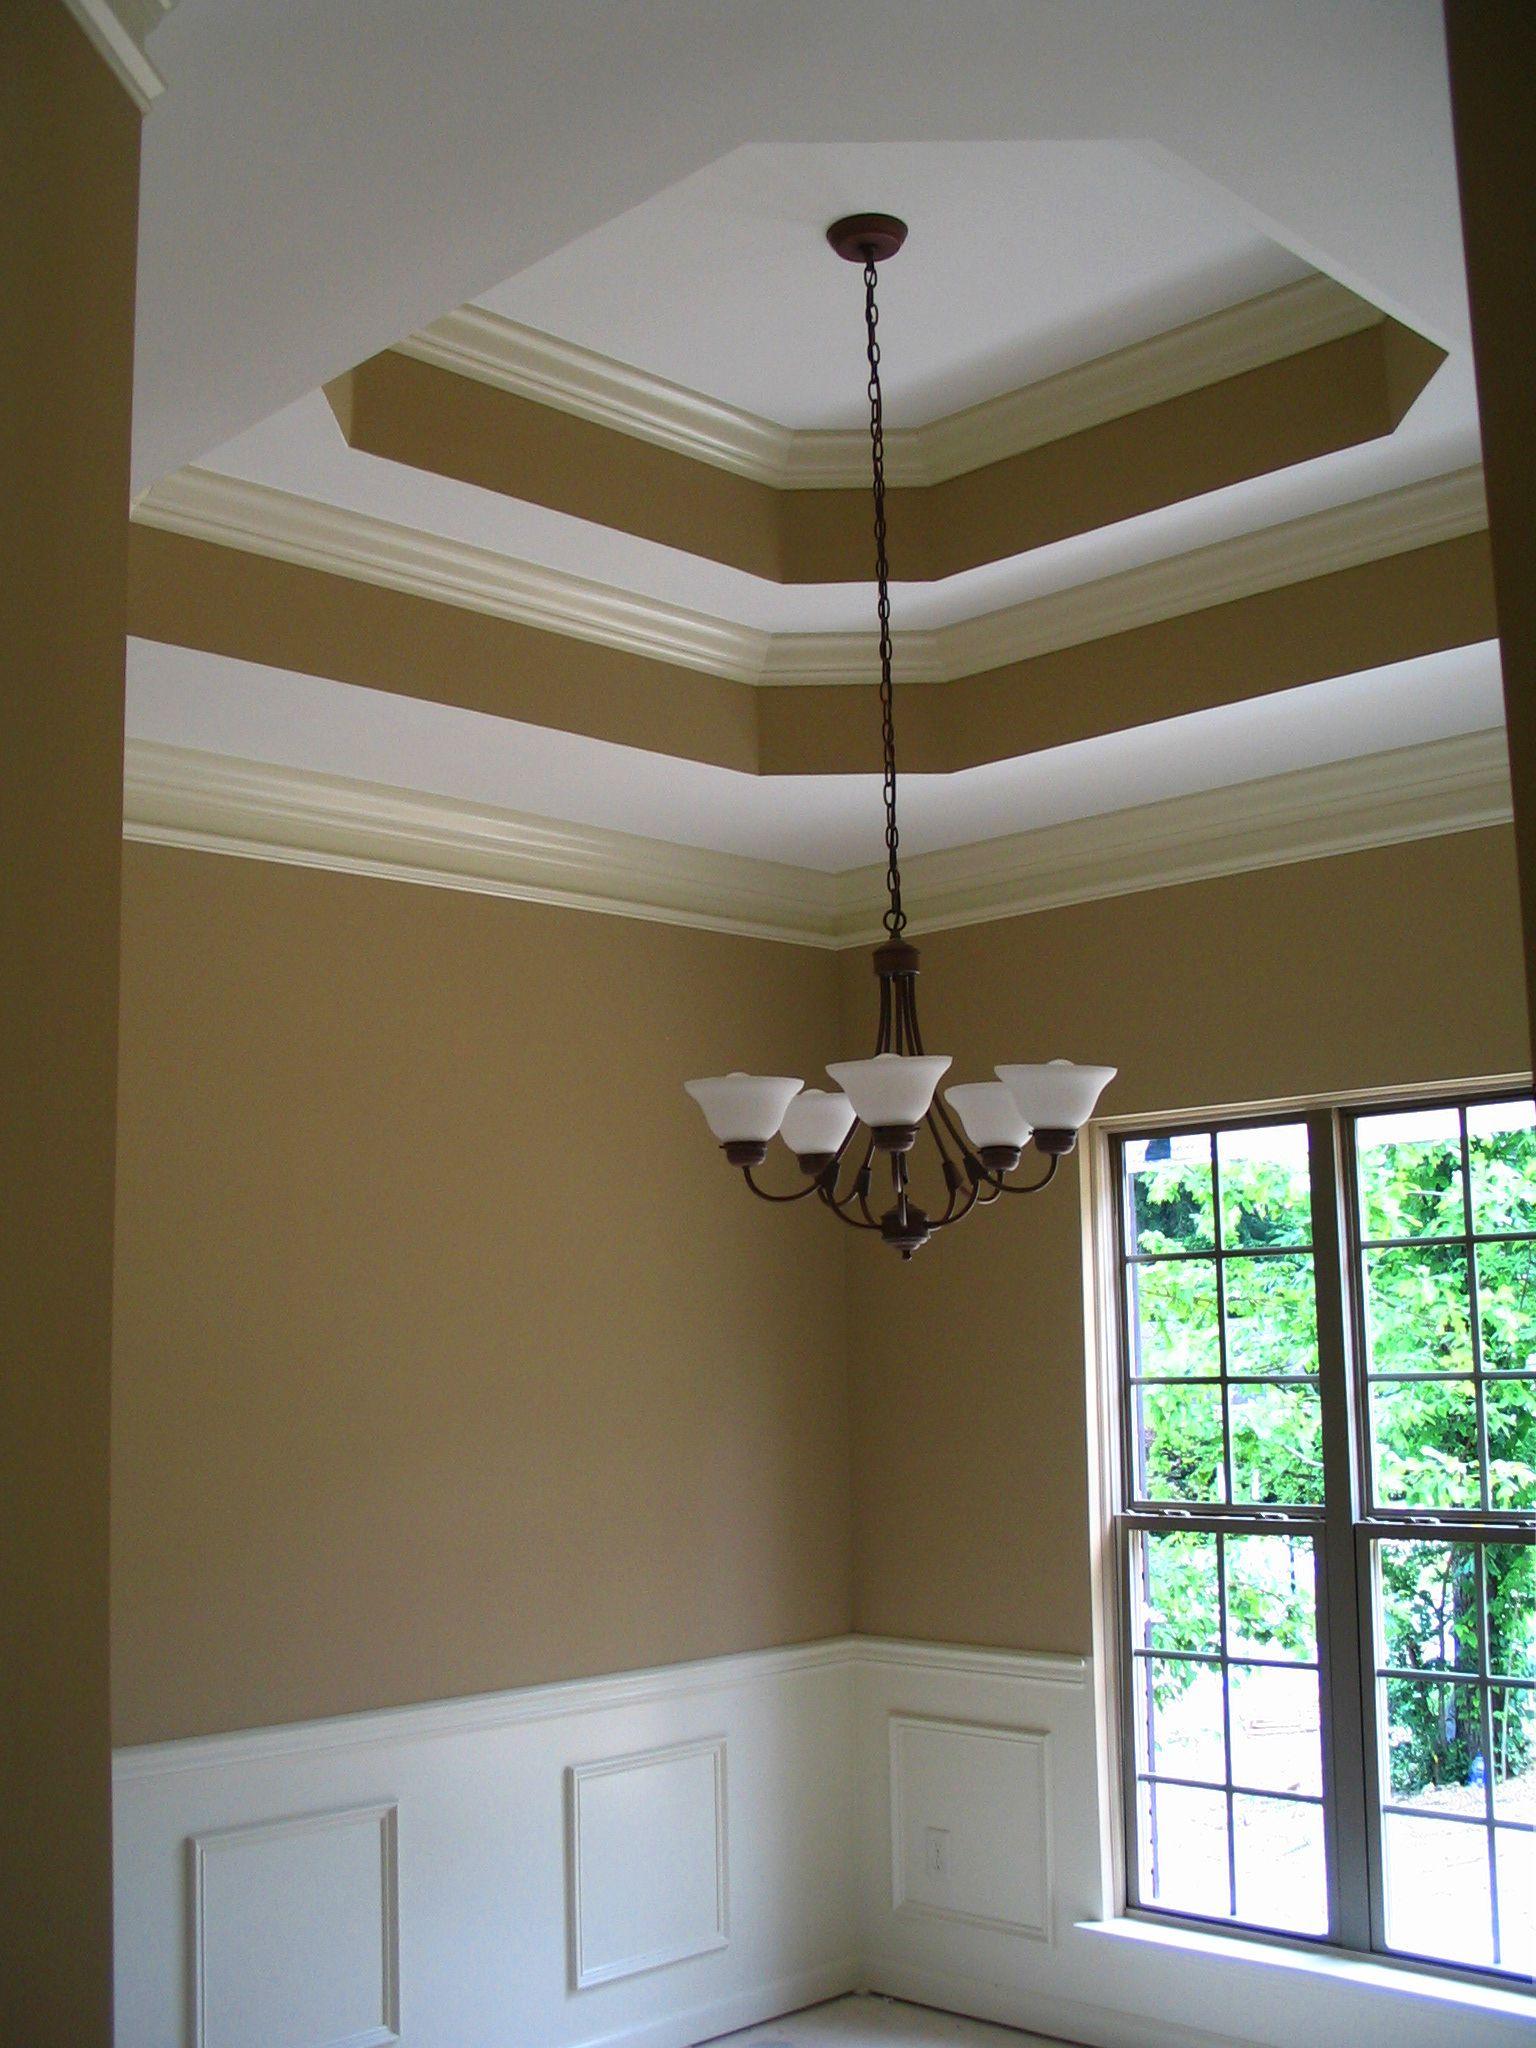 Double Tray Ceiling Ideas | www.Gradschoolfairs.com